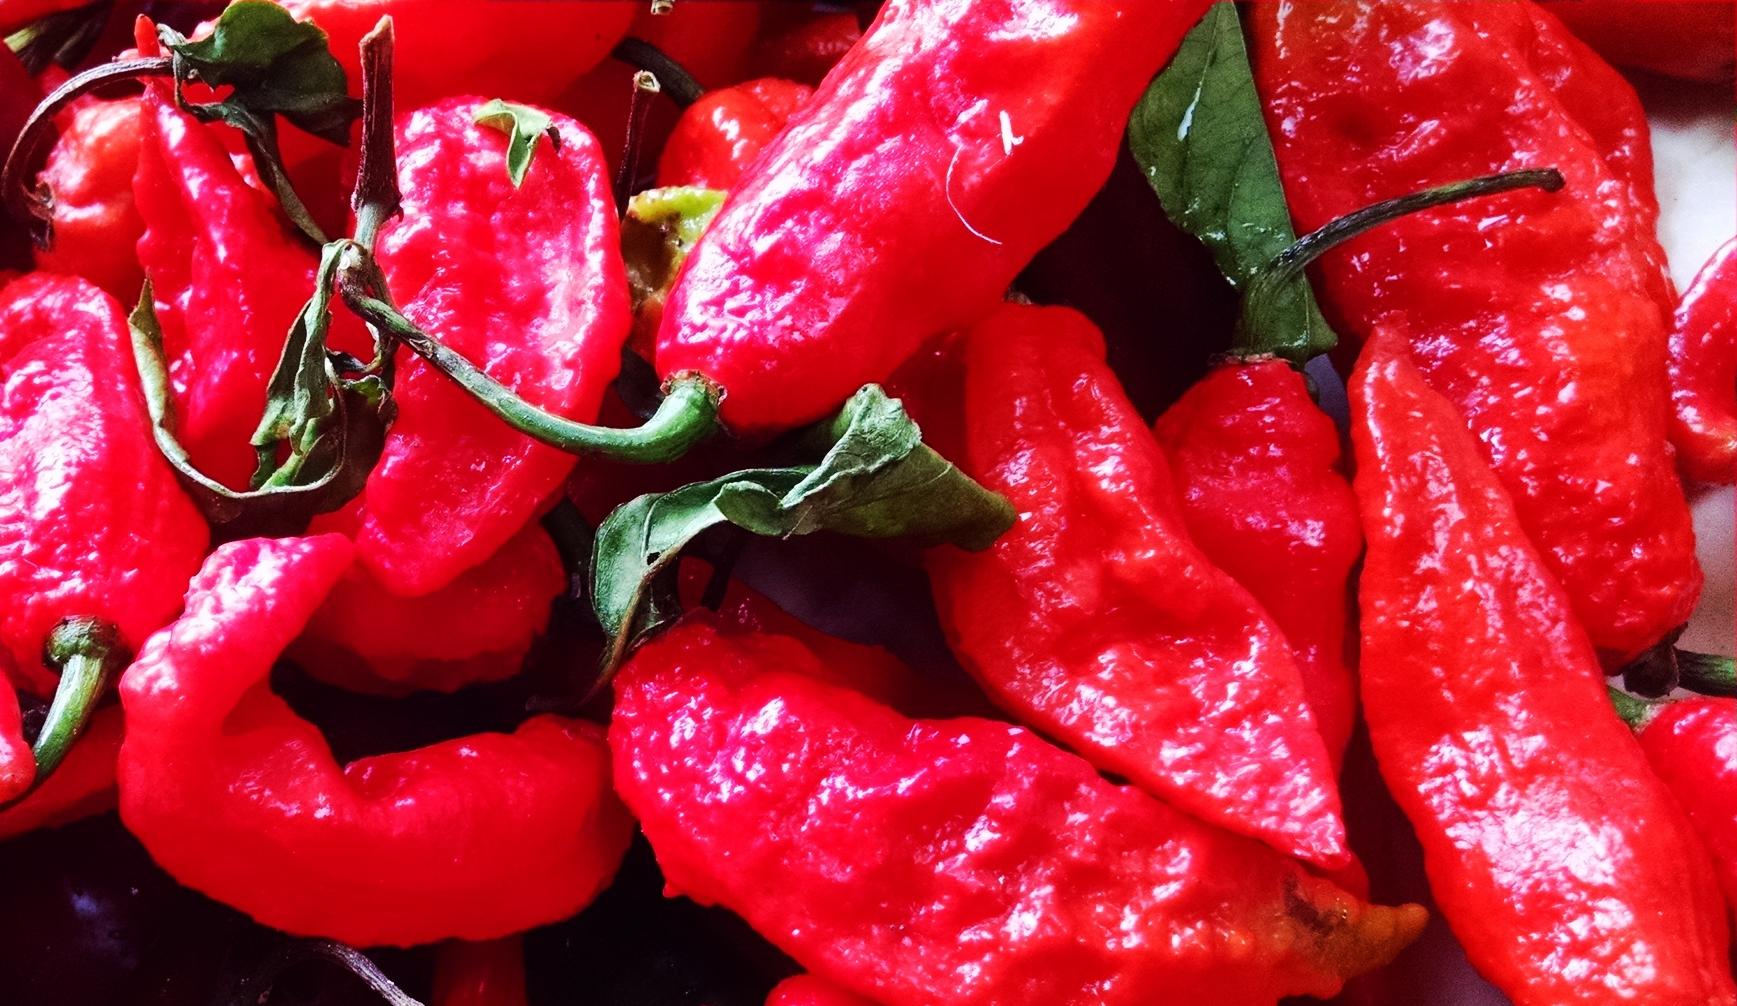 Bhut Jolokia/Ghost Pepper/Red Naga/Naga Jolokia/U-Morok/ ভোট-জলকীয়া (Assamese)